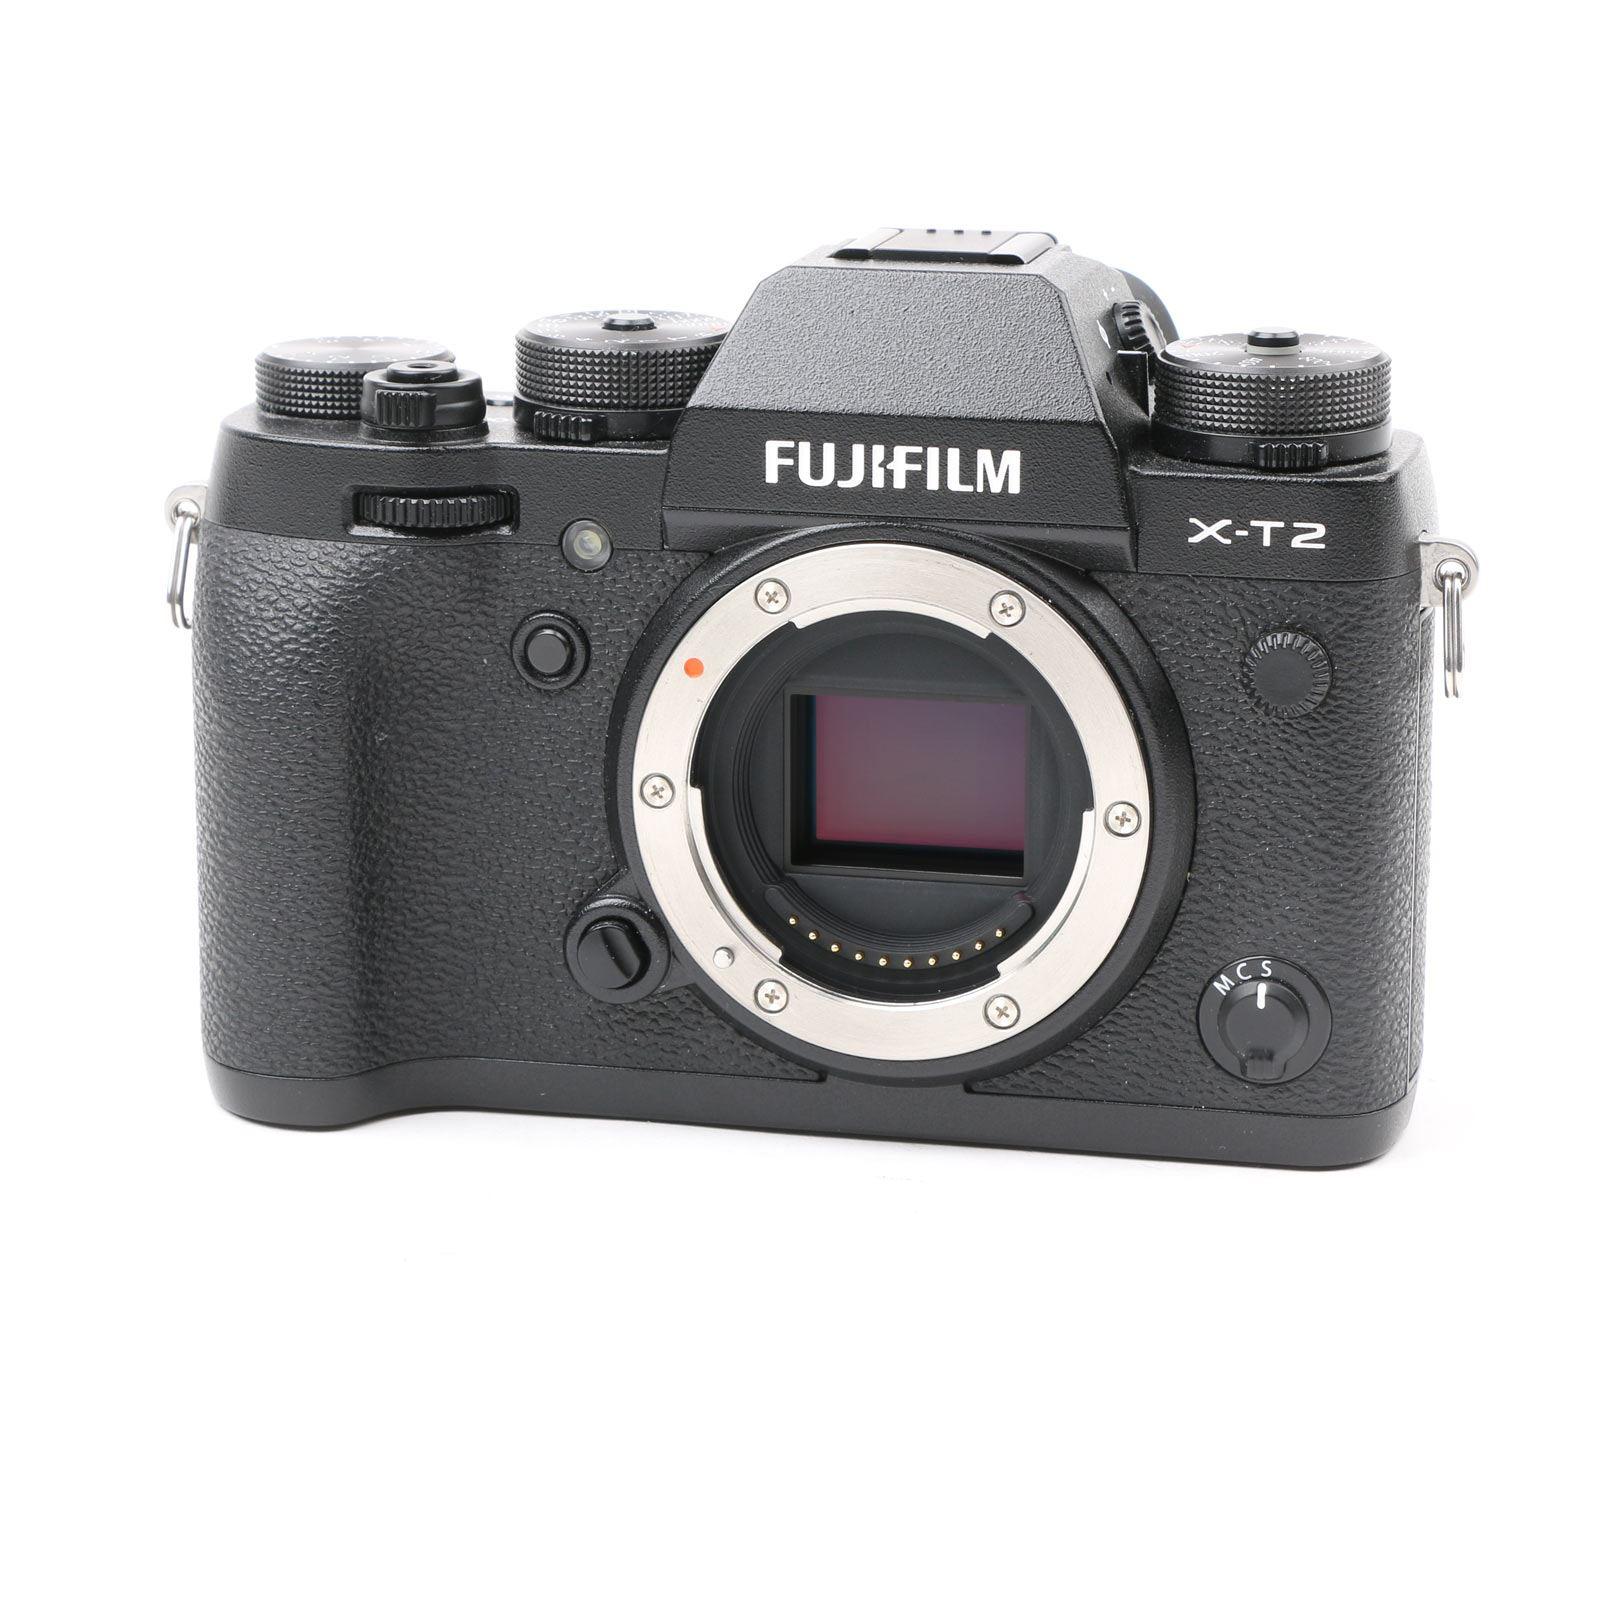 Image of Used Fujifilm X-T2 Digital Camera Body